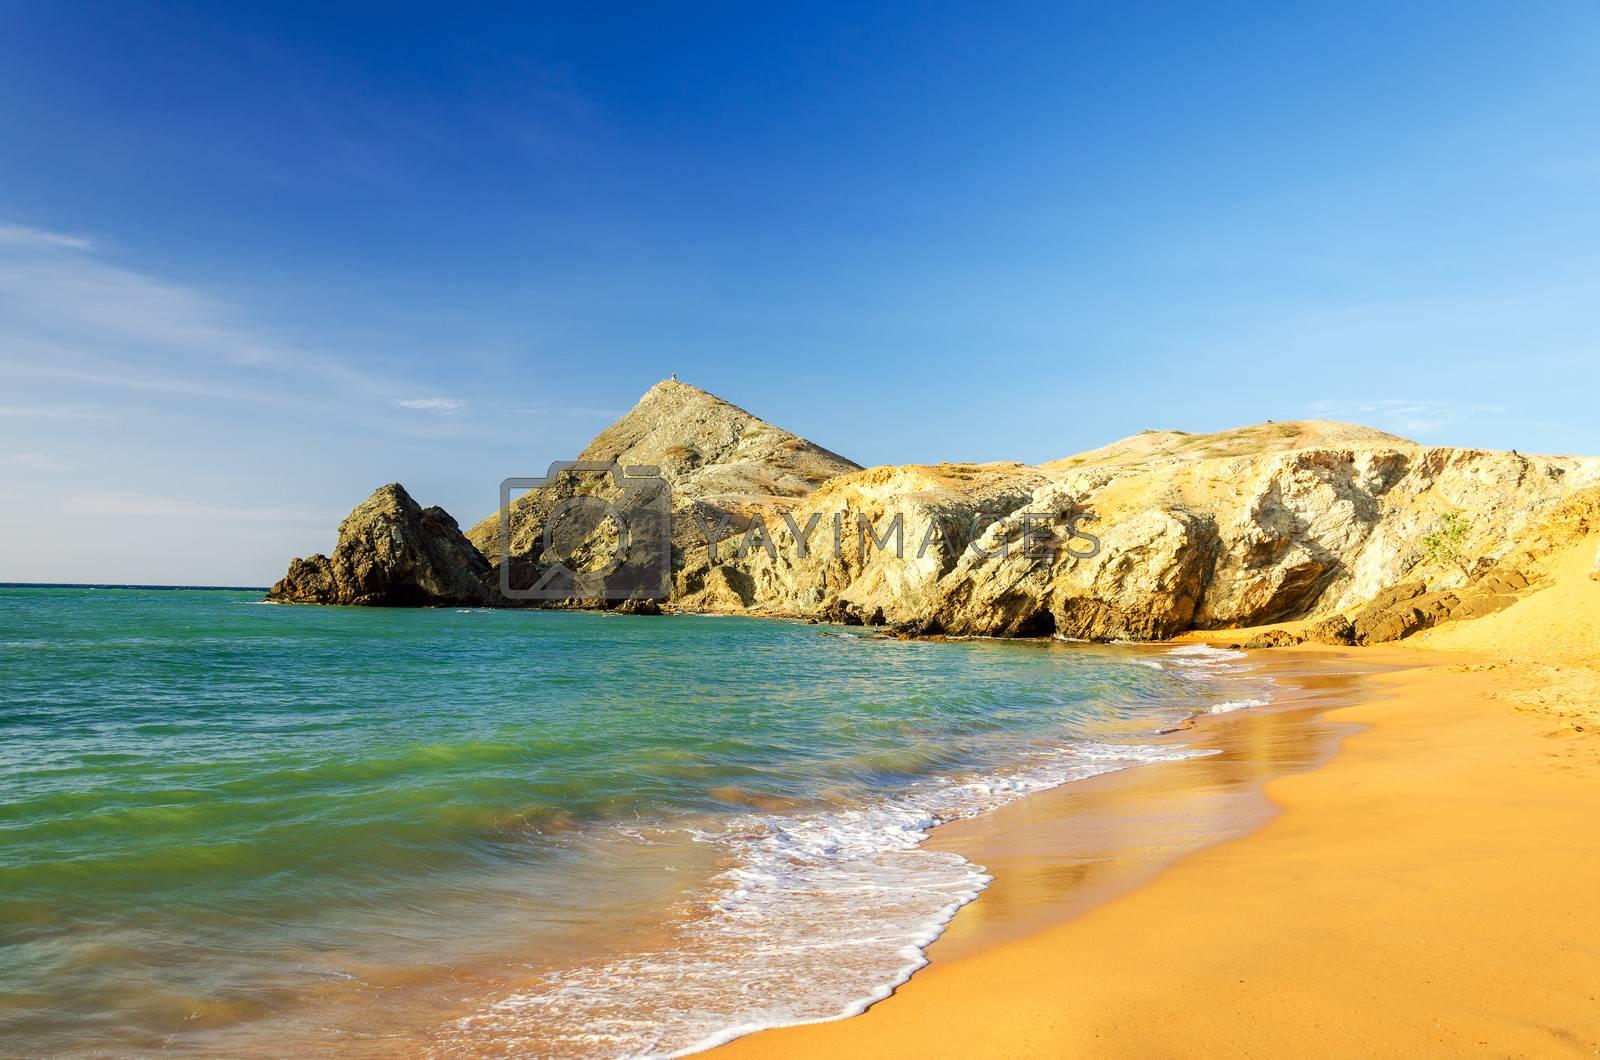 Clear blue water on a desert beach near Cabo de la Vela in La Guajira, Colombia